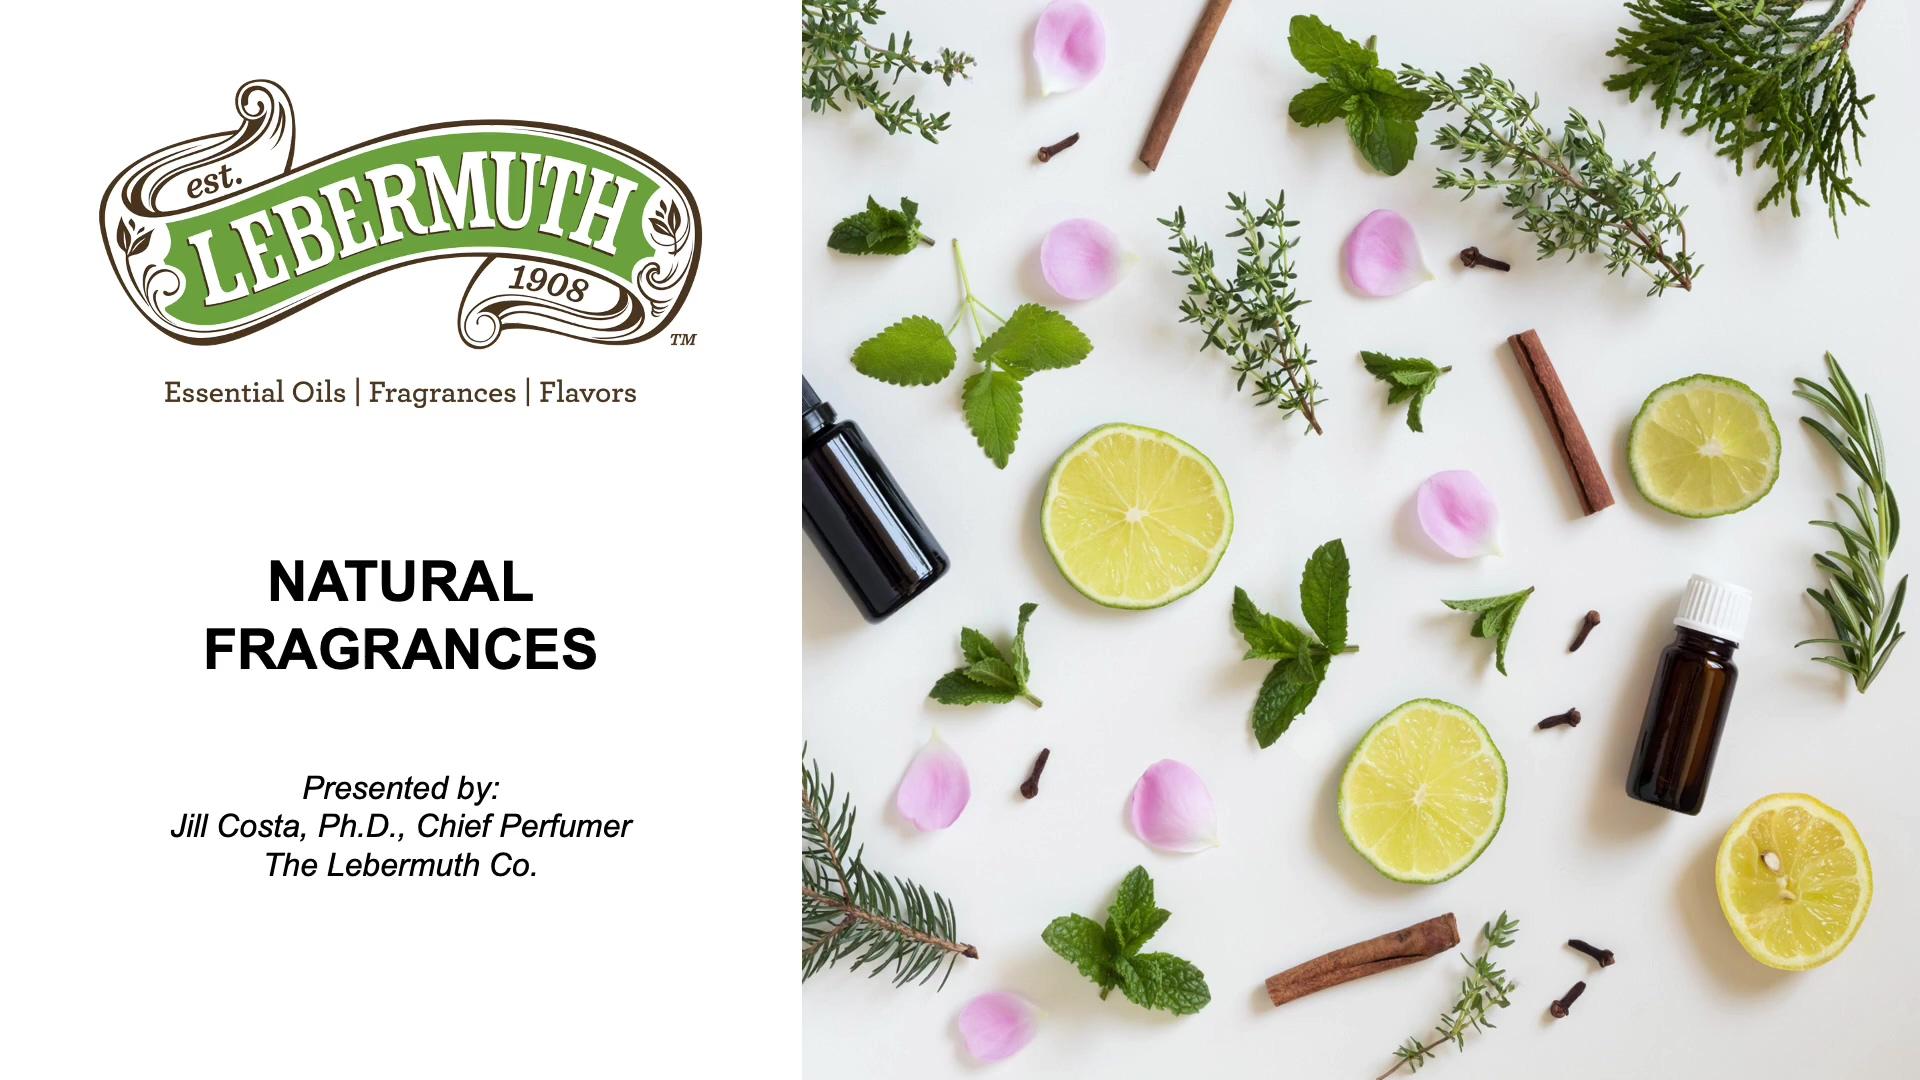 Lebermuth Natural Fragrance Presentation-1